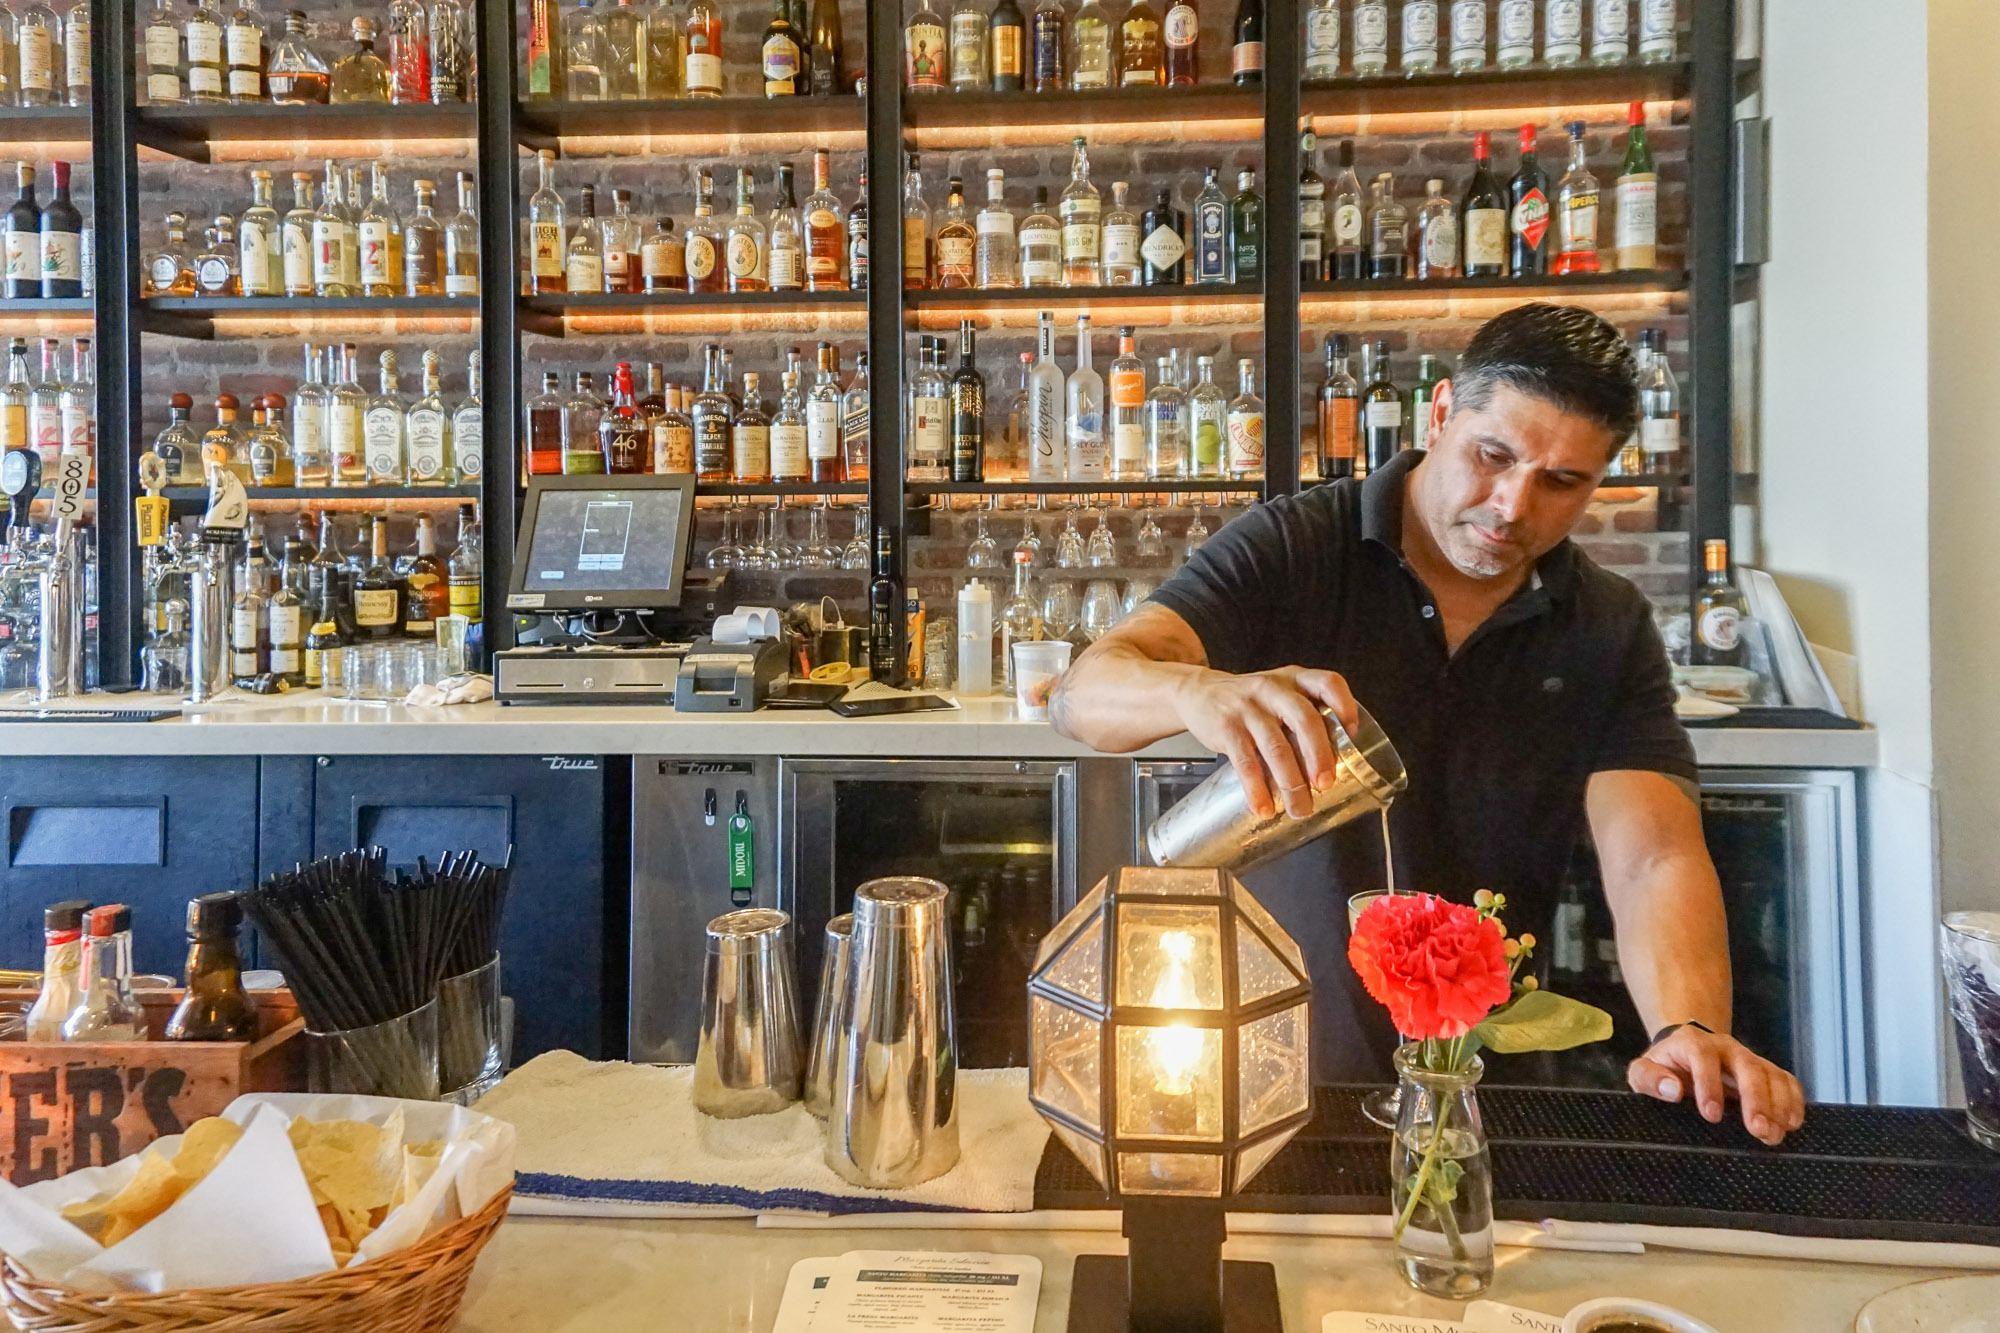 Santo Mescal at Hotel Indigo Santa Barbara has great drinks in its gorgeous bar area.